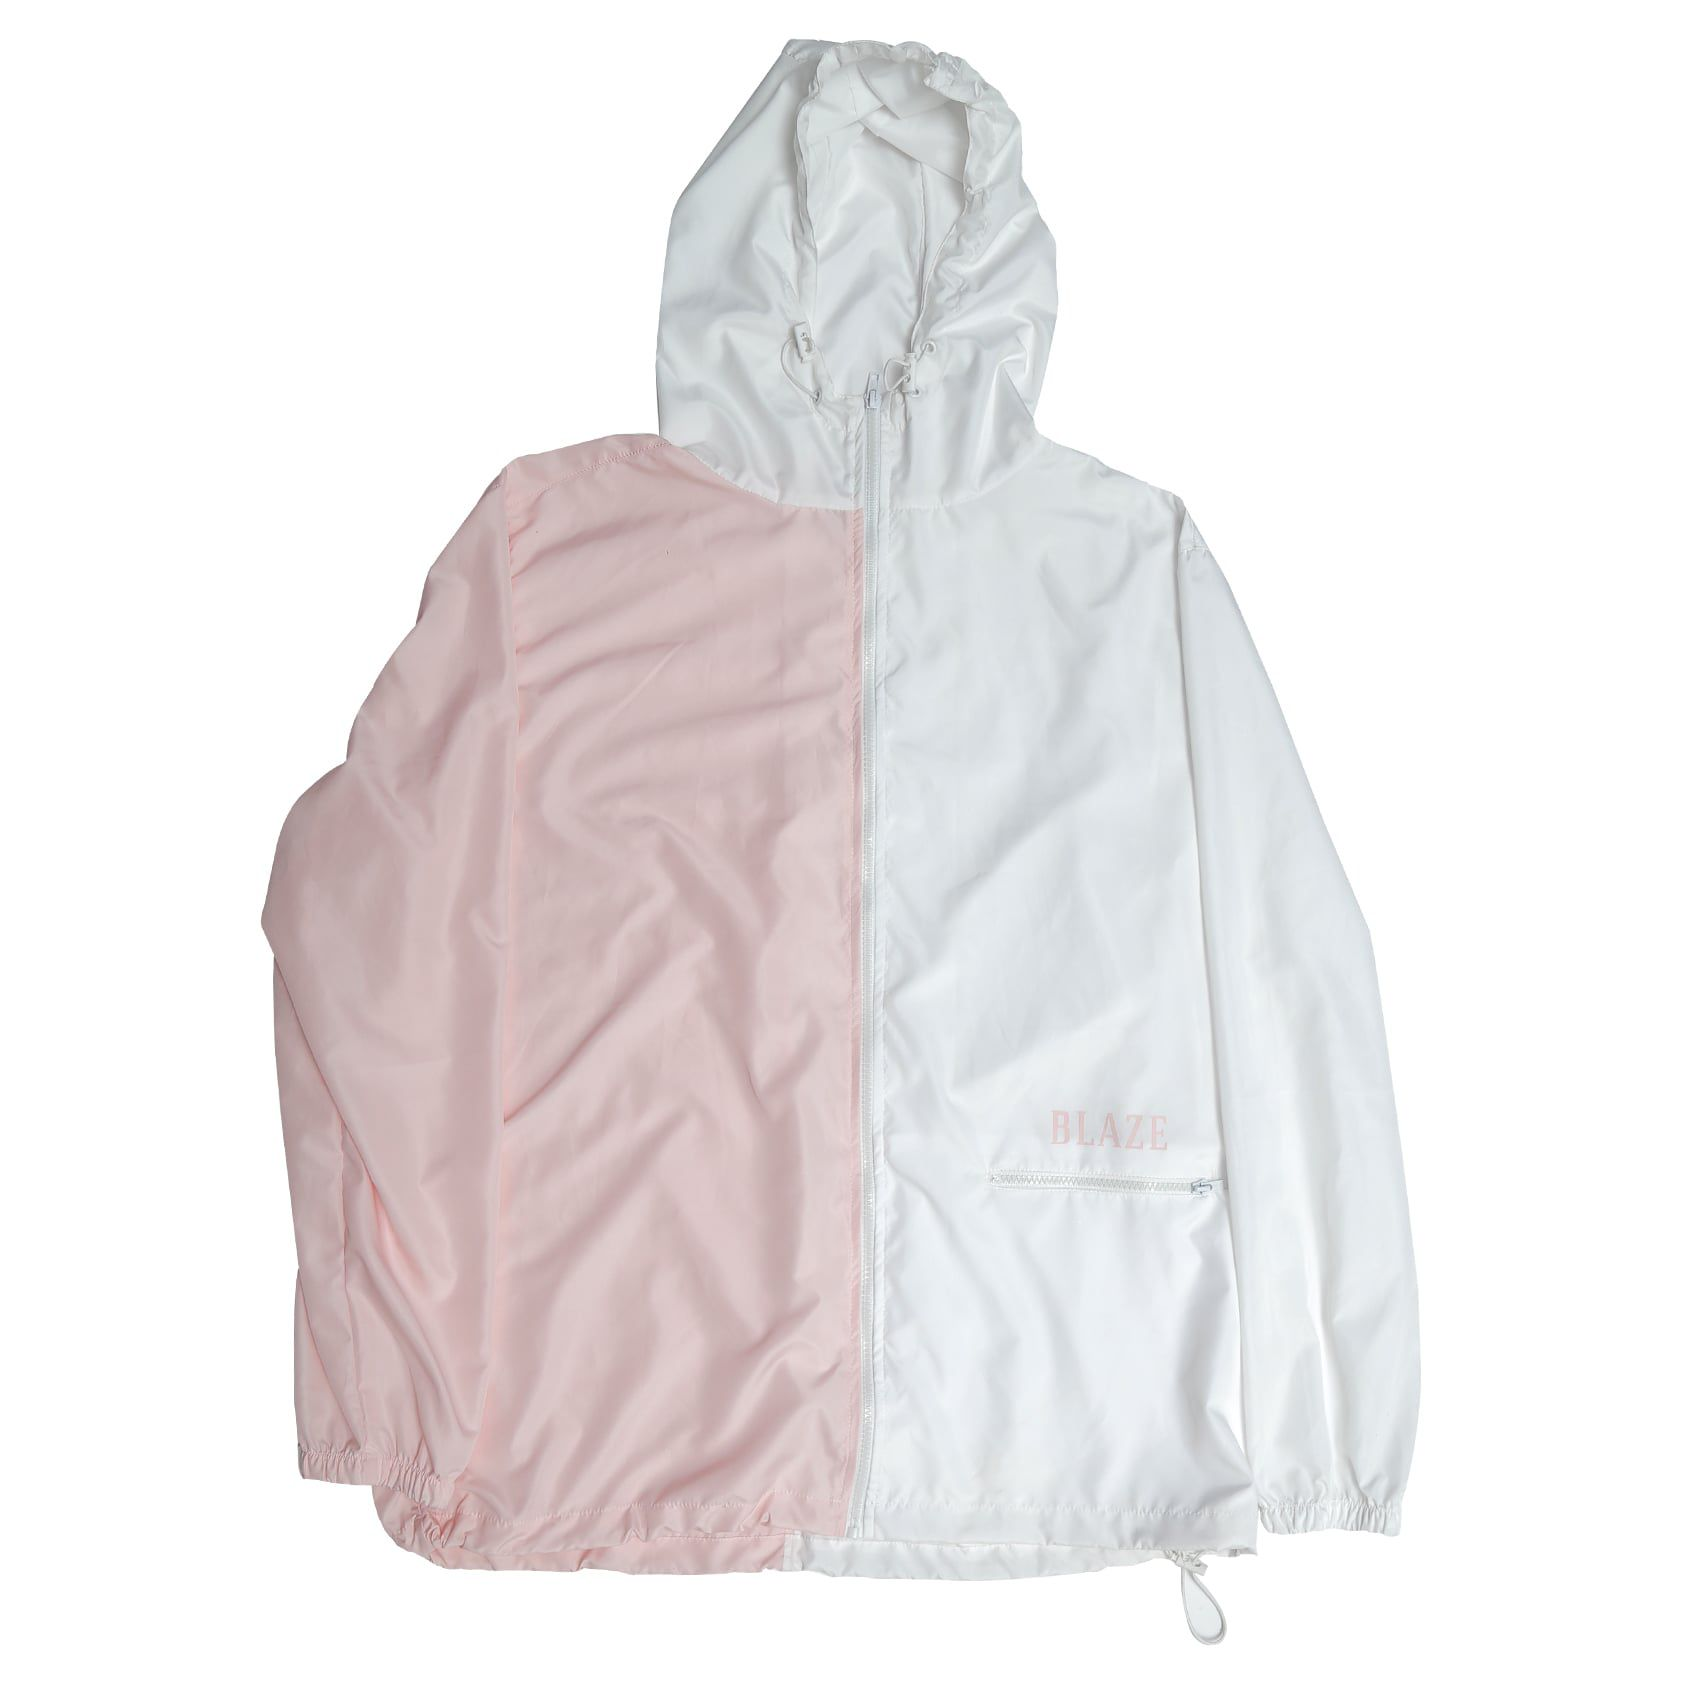 Jaqueta Corta Vento Blaze Bi Color Skin - Rosa/Branco